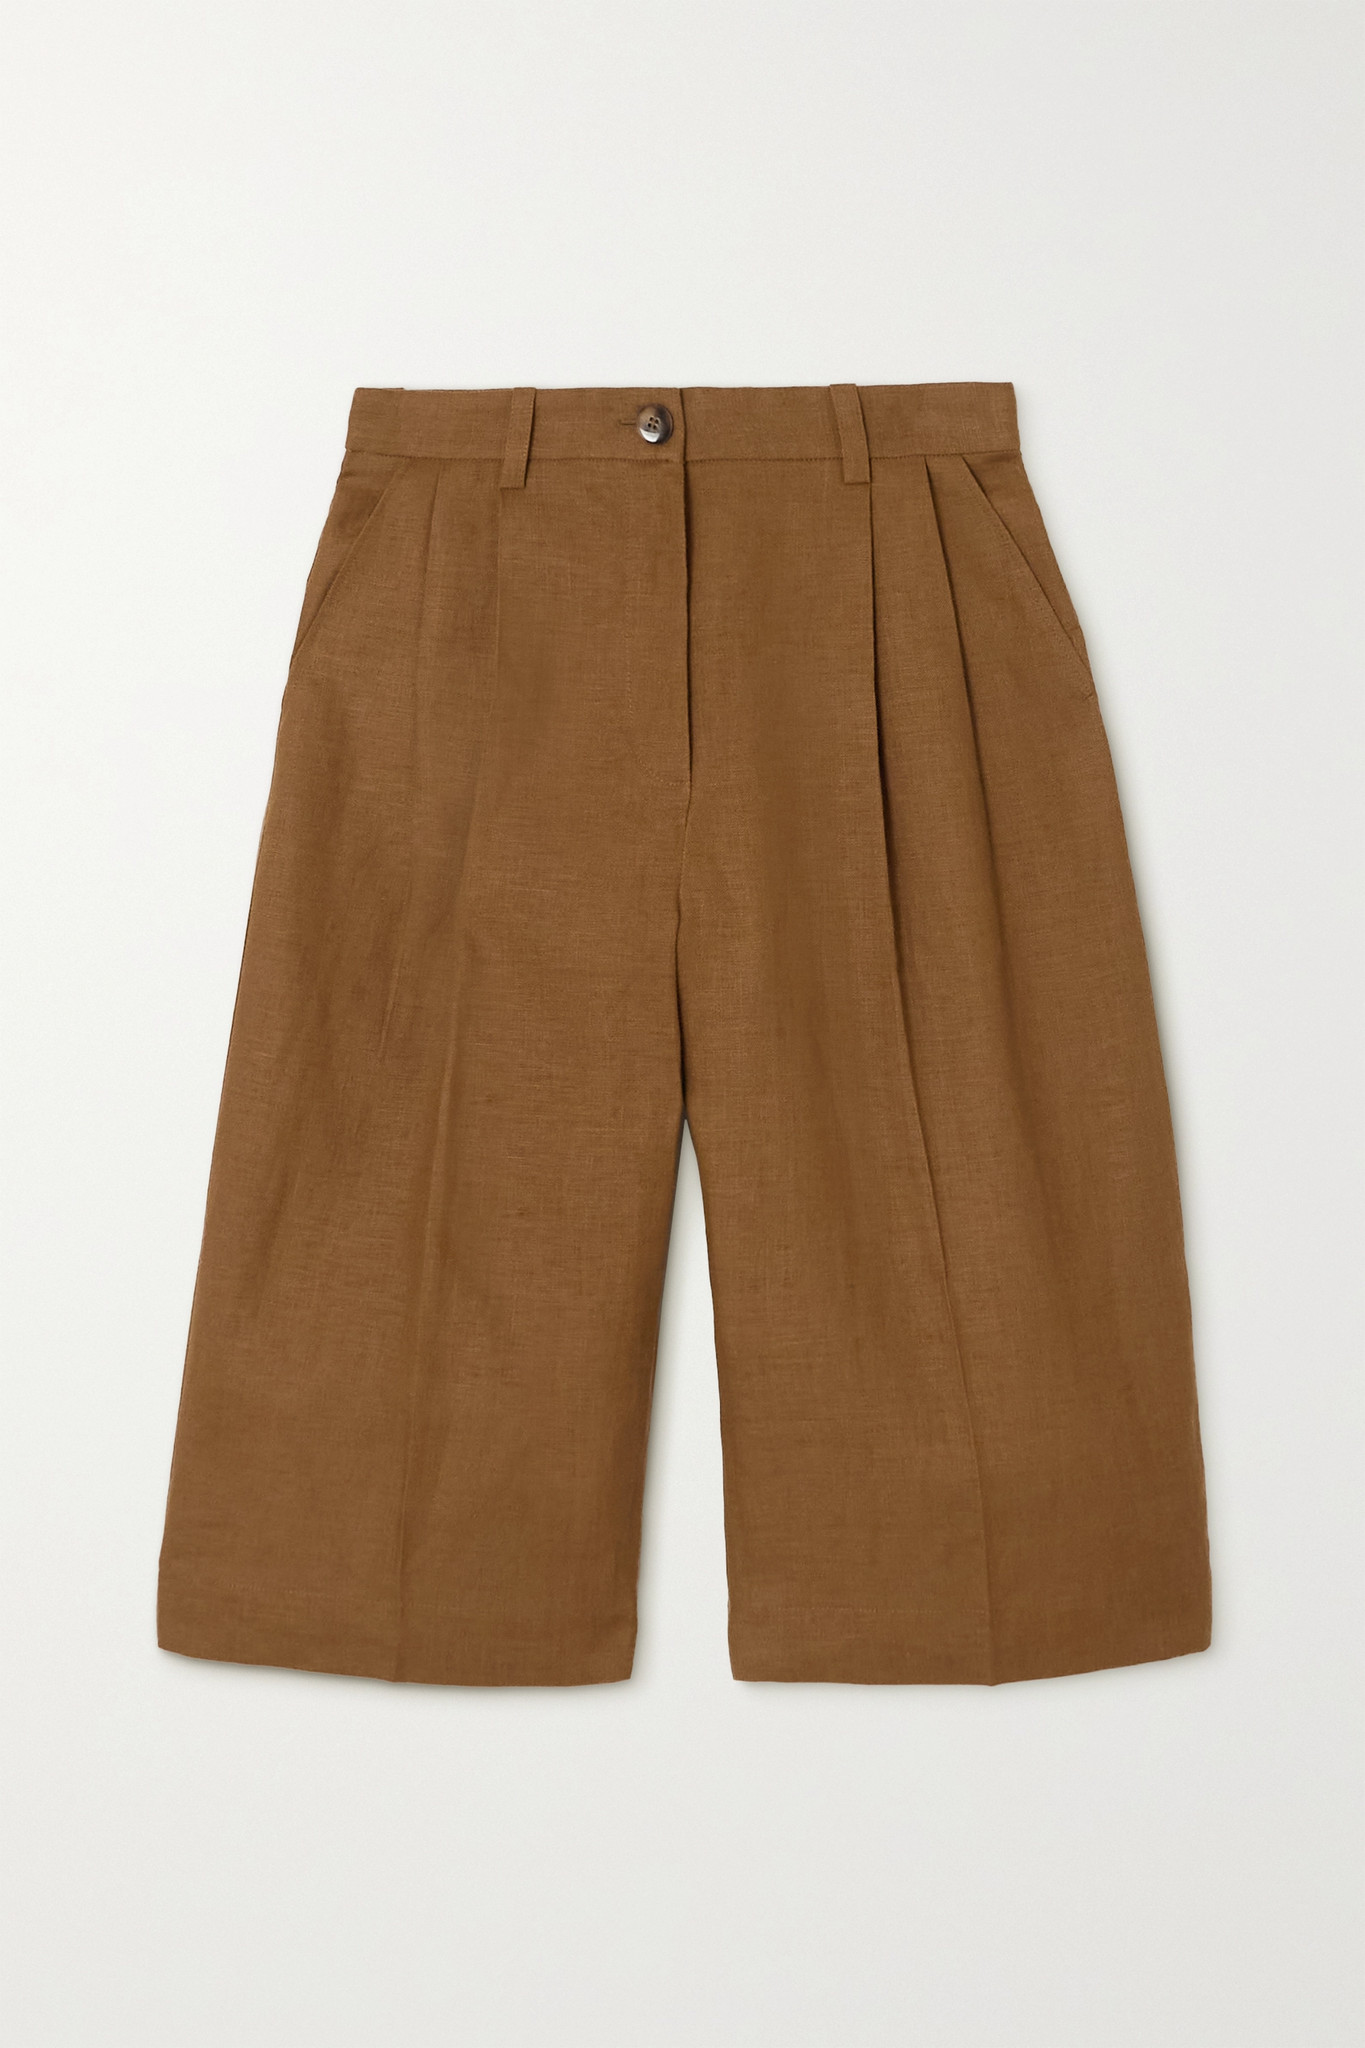 BOUGUESSA - Meera 褶裥亚麻短裤 - 棕色 - x small